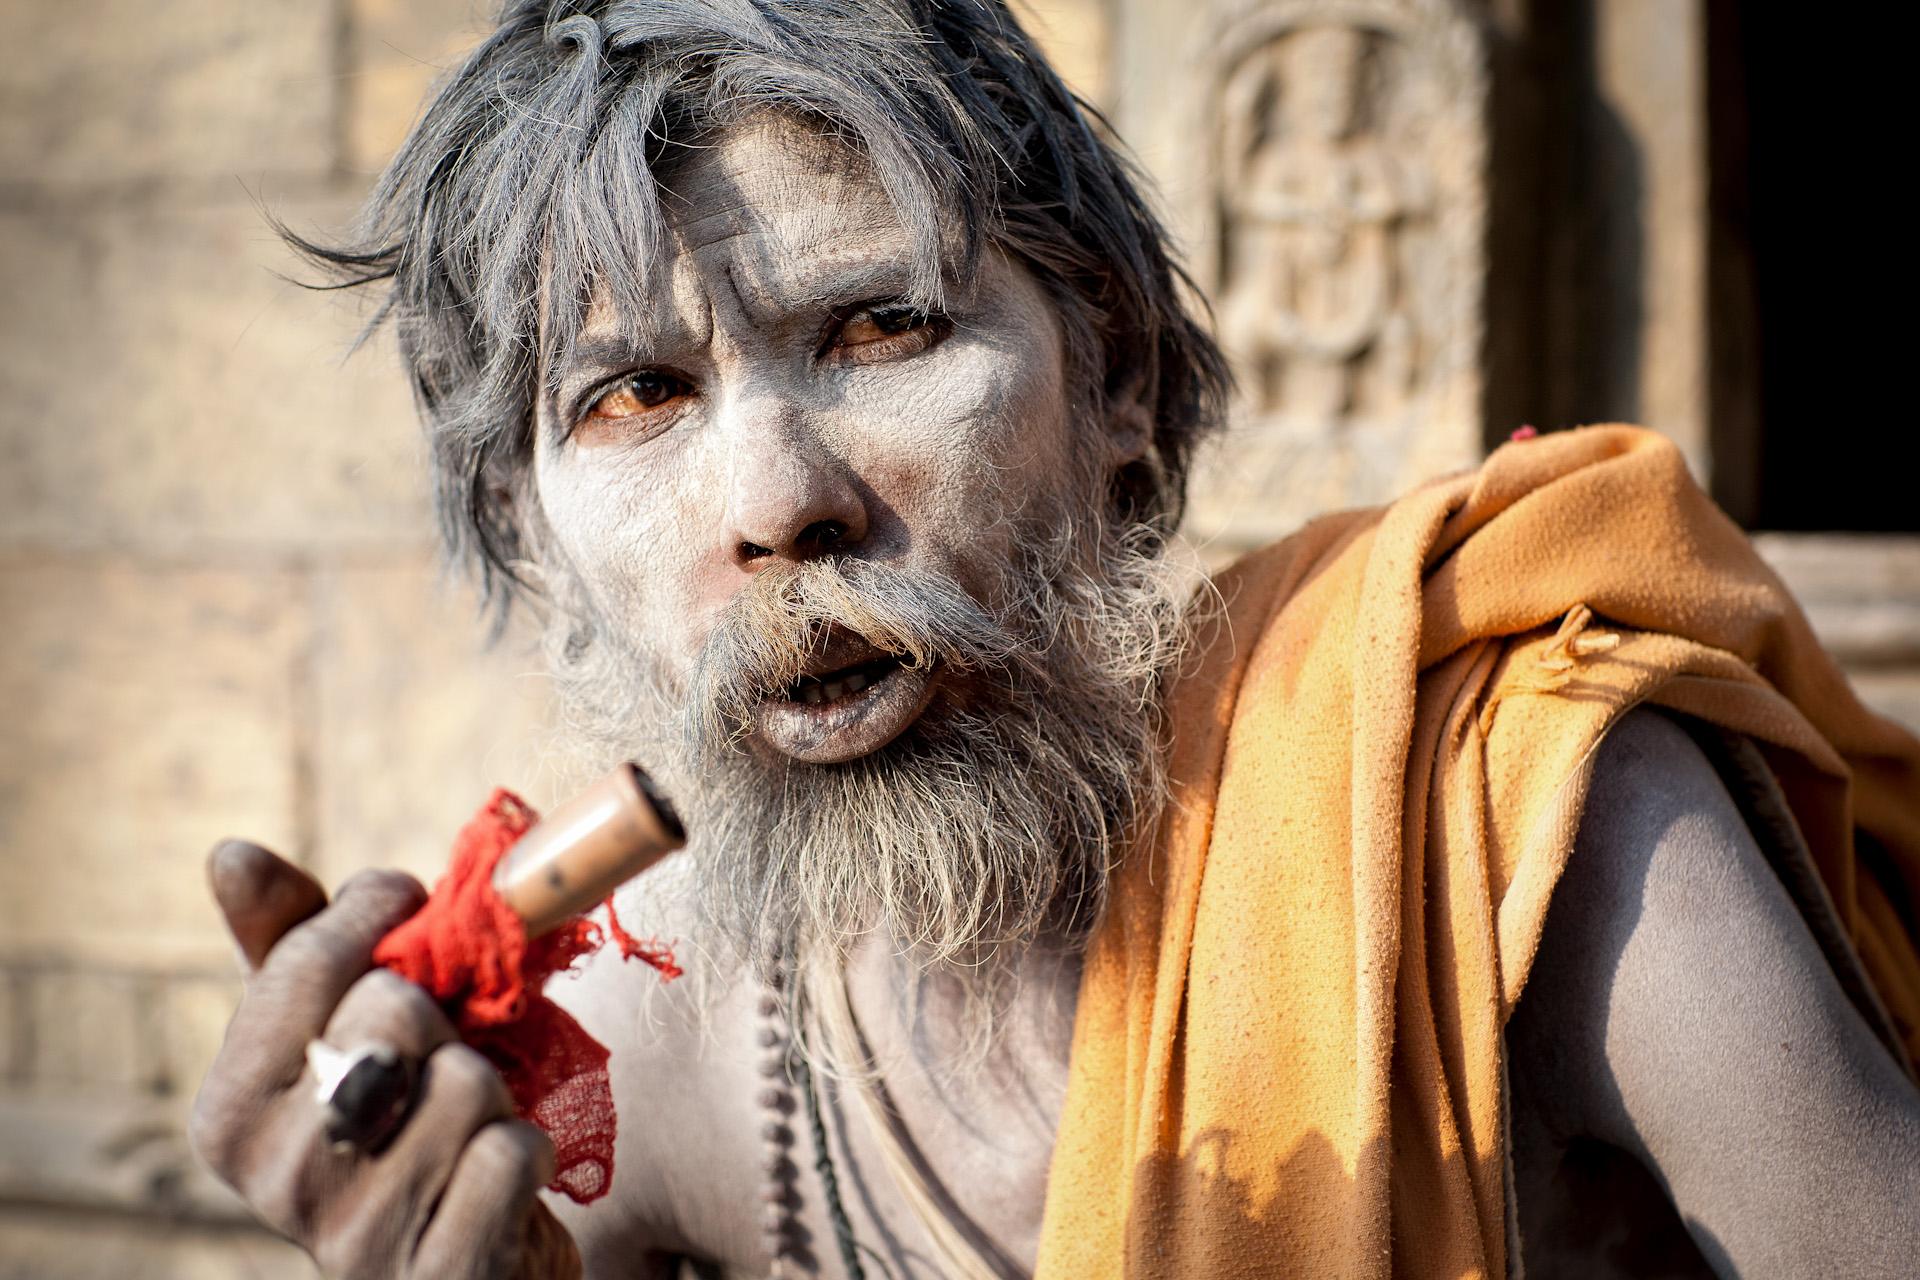 Nepal-Kathmandu-Travel-Sadhu-Smoke-Pashupatinath-Hindu_3.JPG